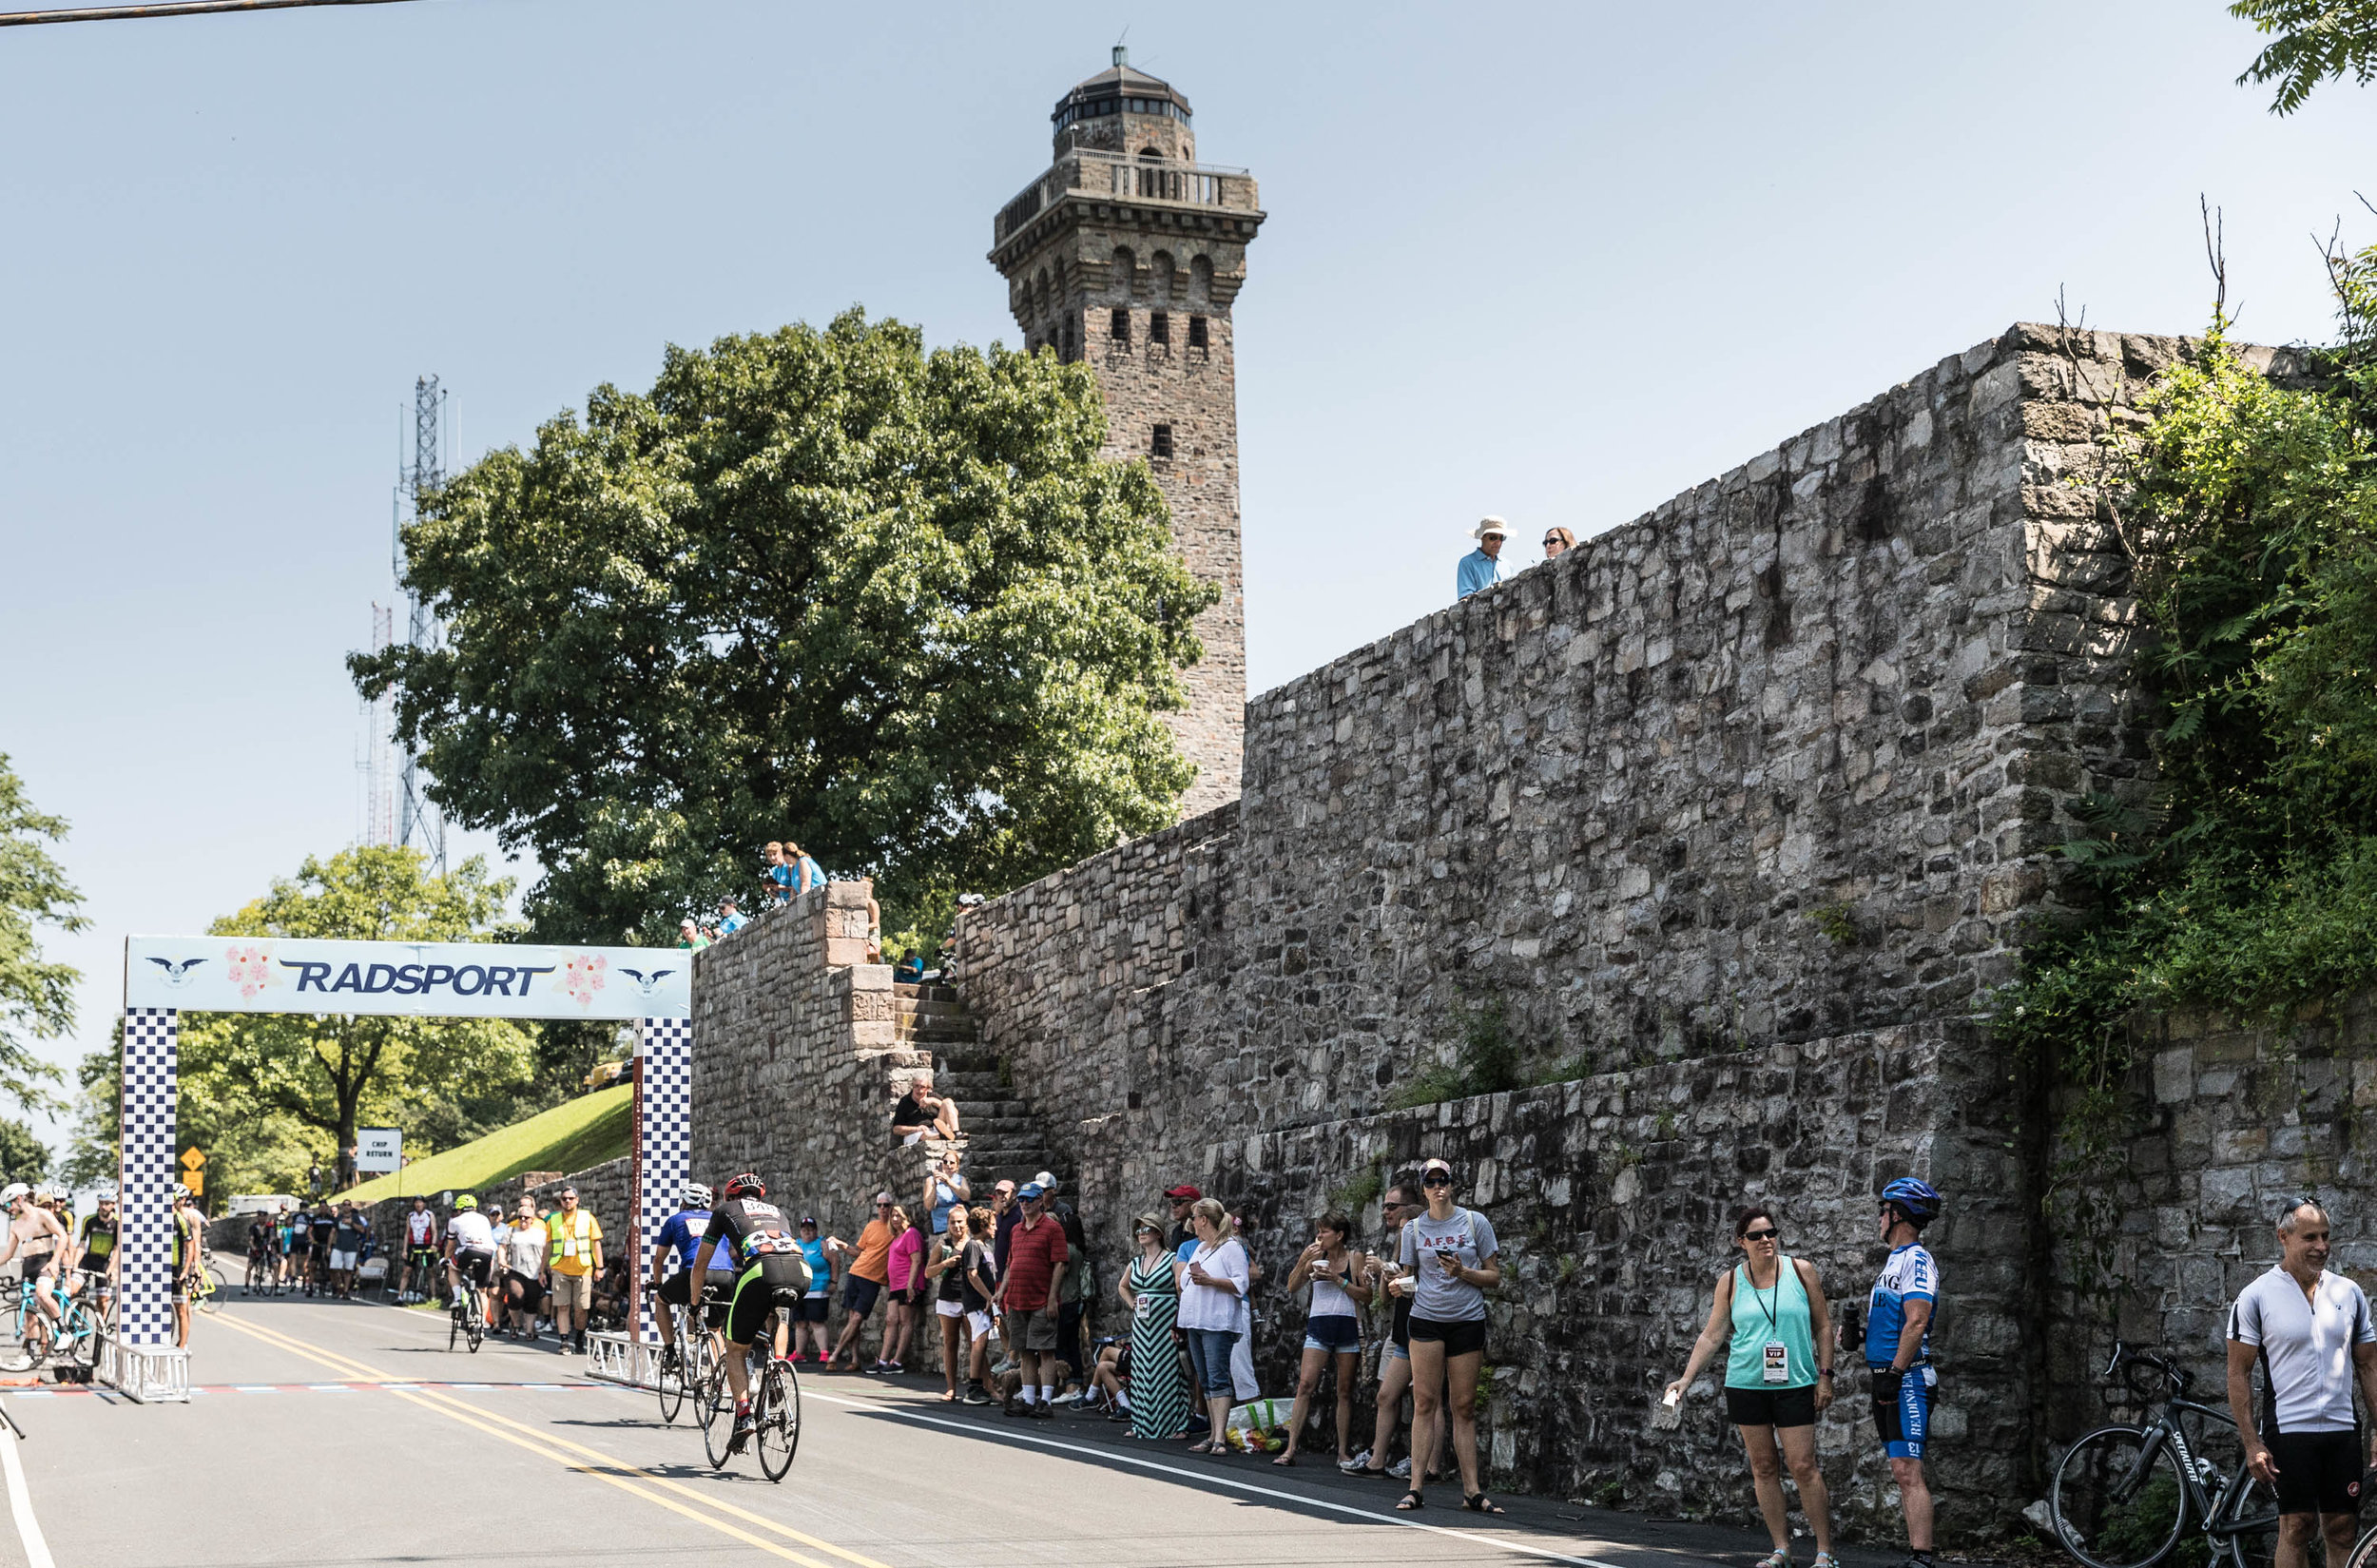 Sunday, Aug 4th - Mt. Penn Hillclimb / Radsport Festival